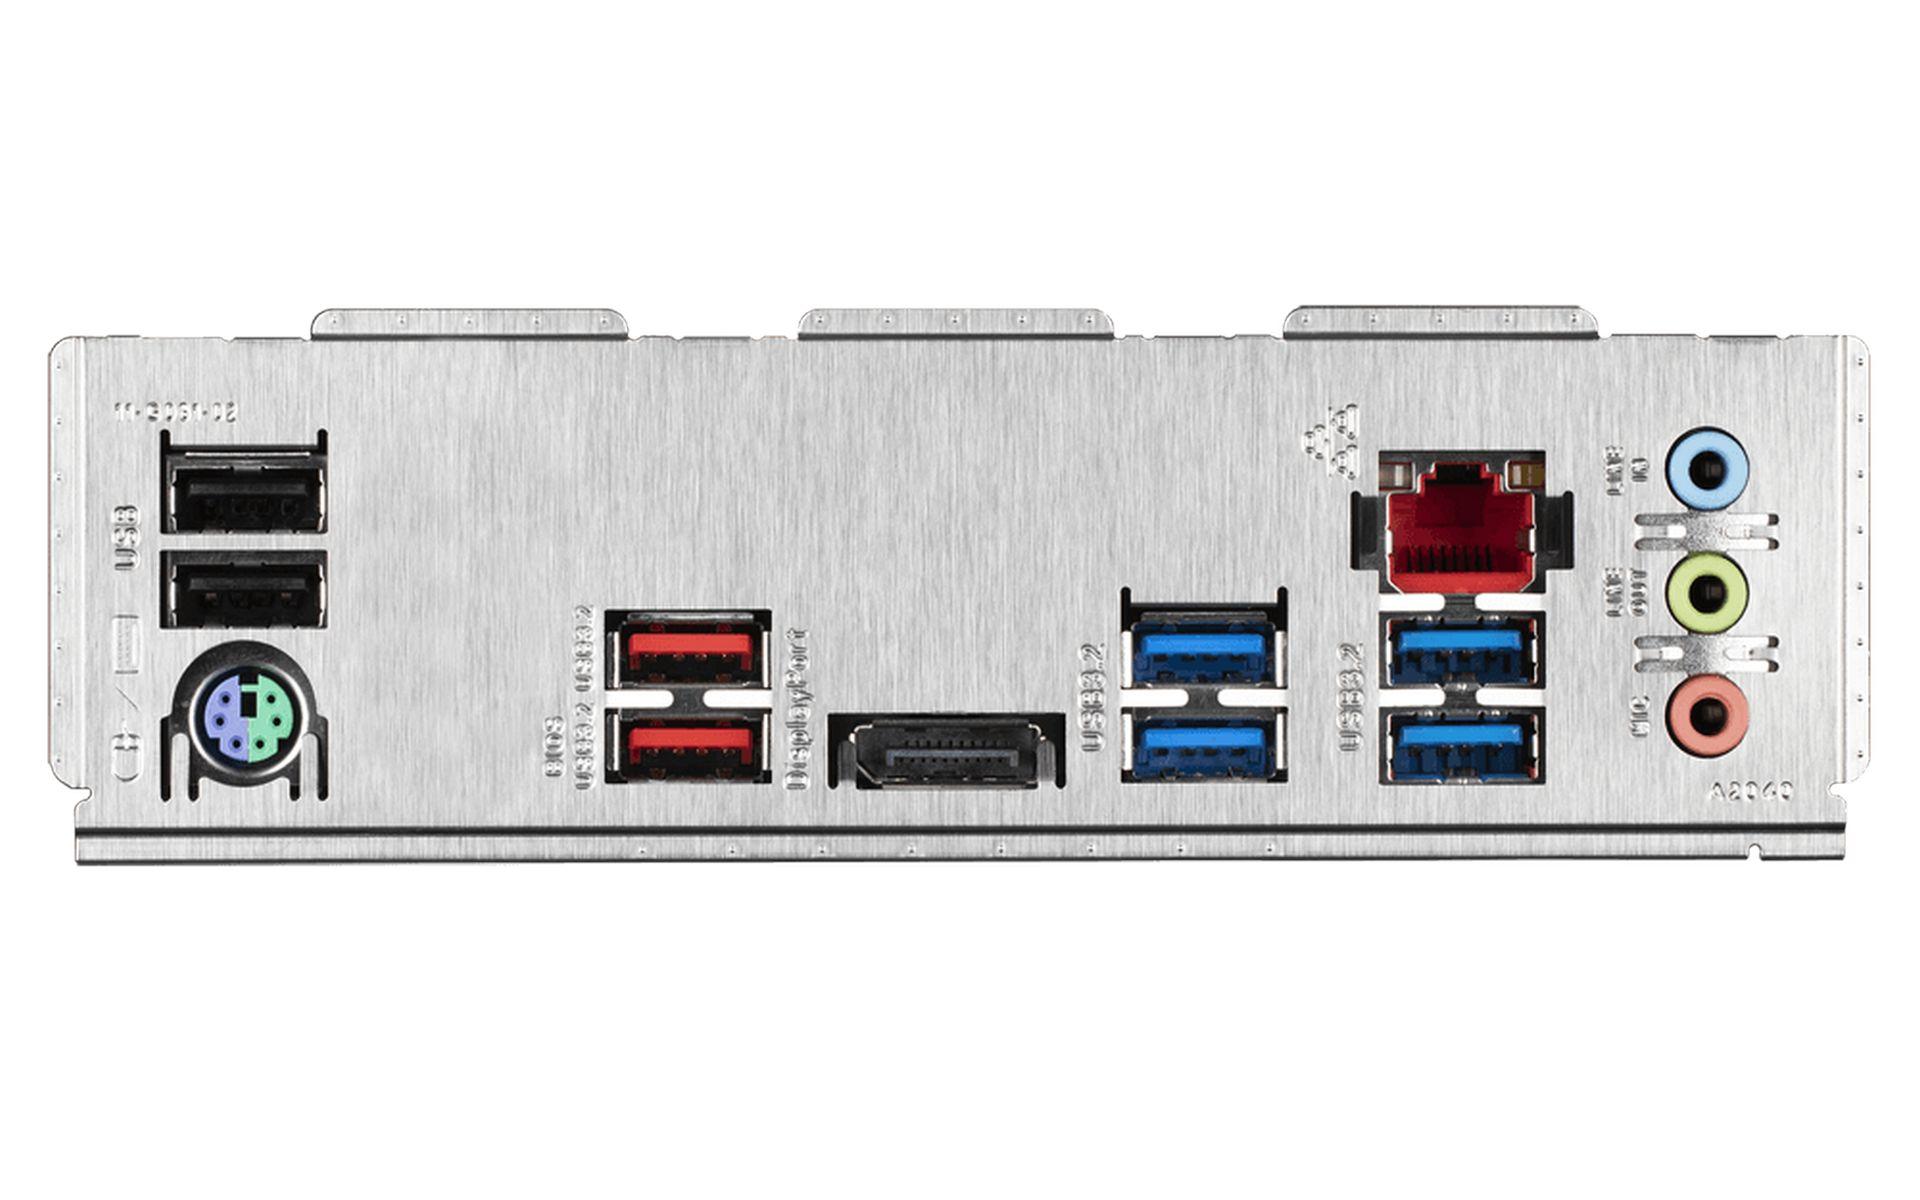 Z590 UD sử dụng mạng LAN 2.5G